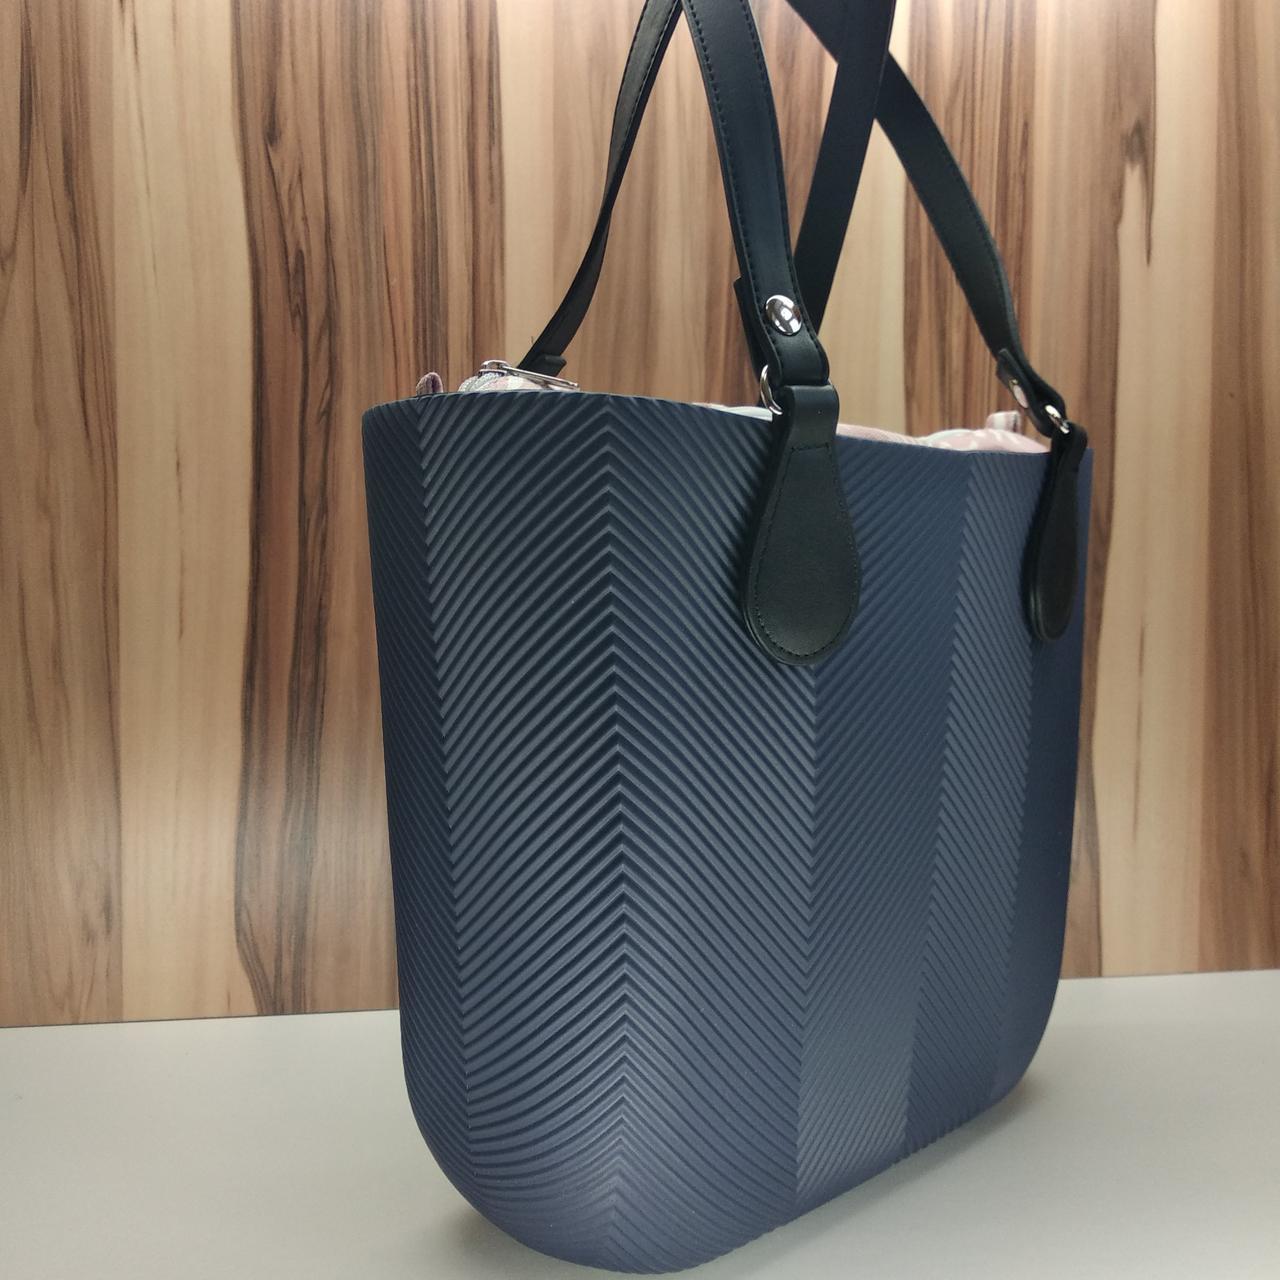 d36ab5848f74 Сумка IQ bag Mini Tree синий, цена 1 198 грн., купить в Днепре ...